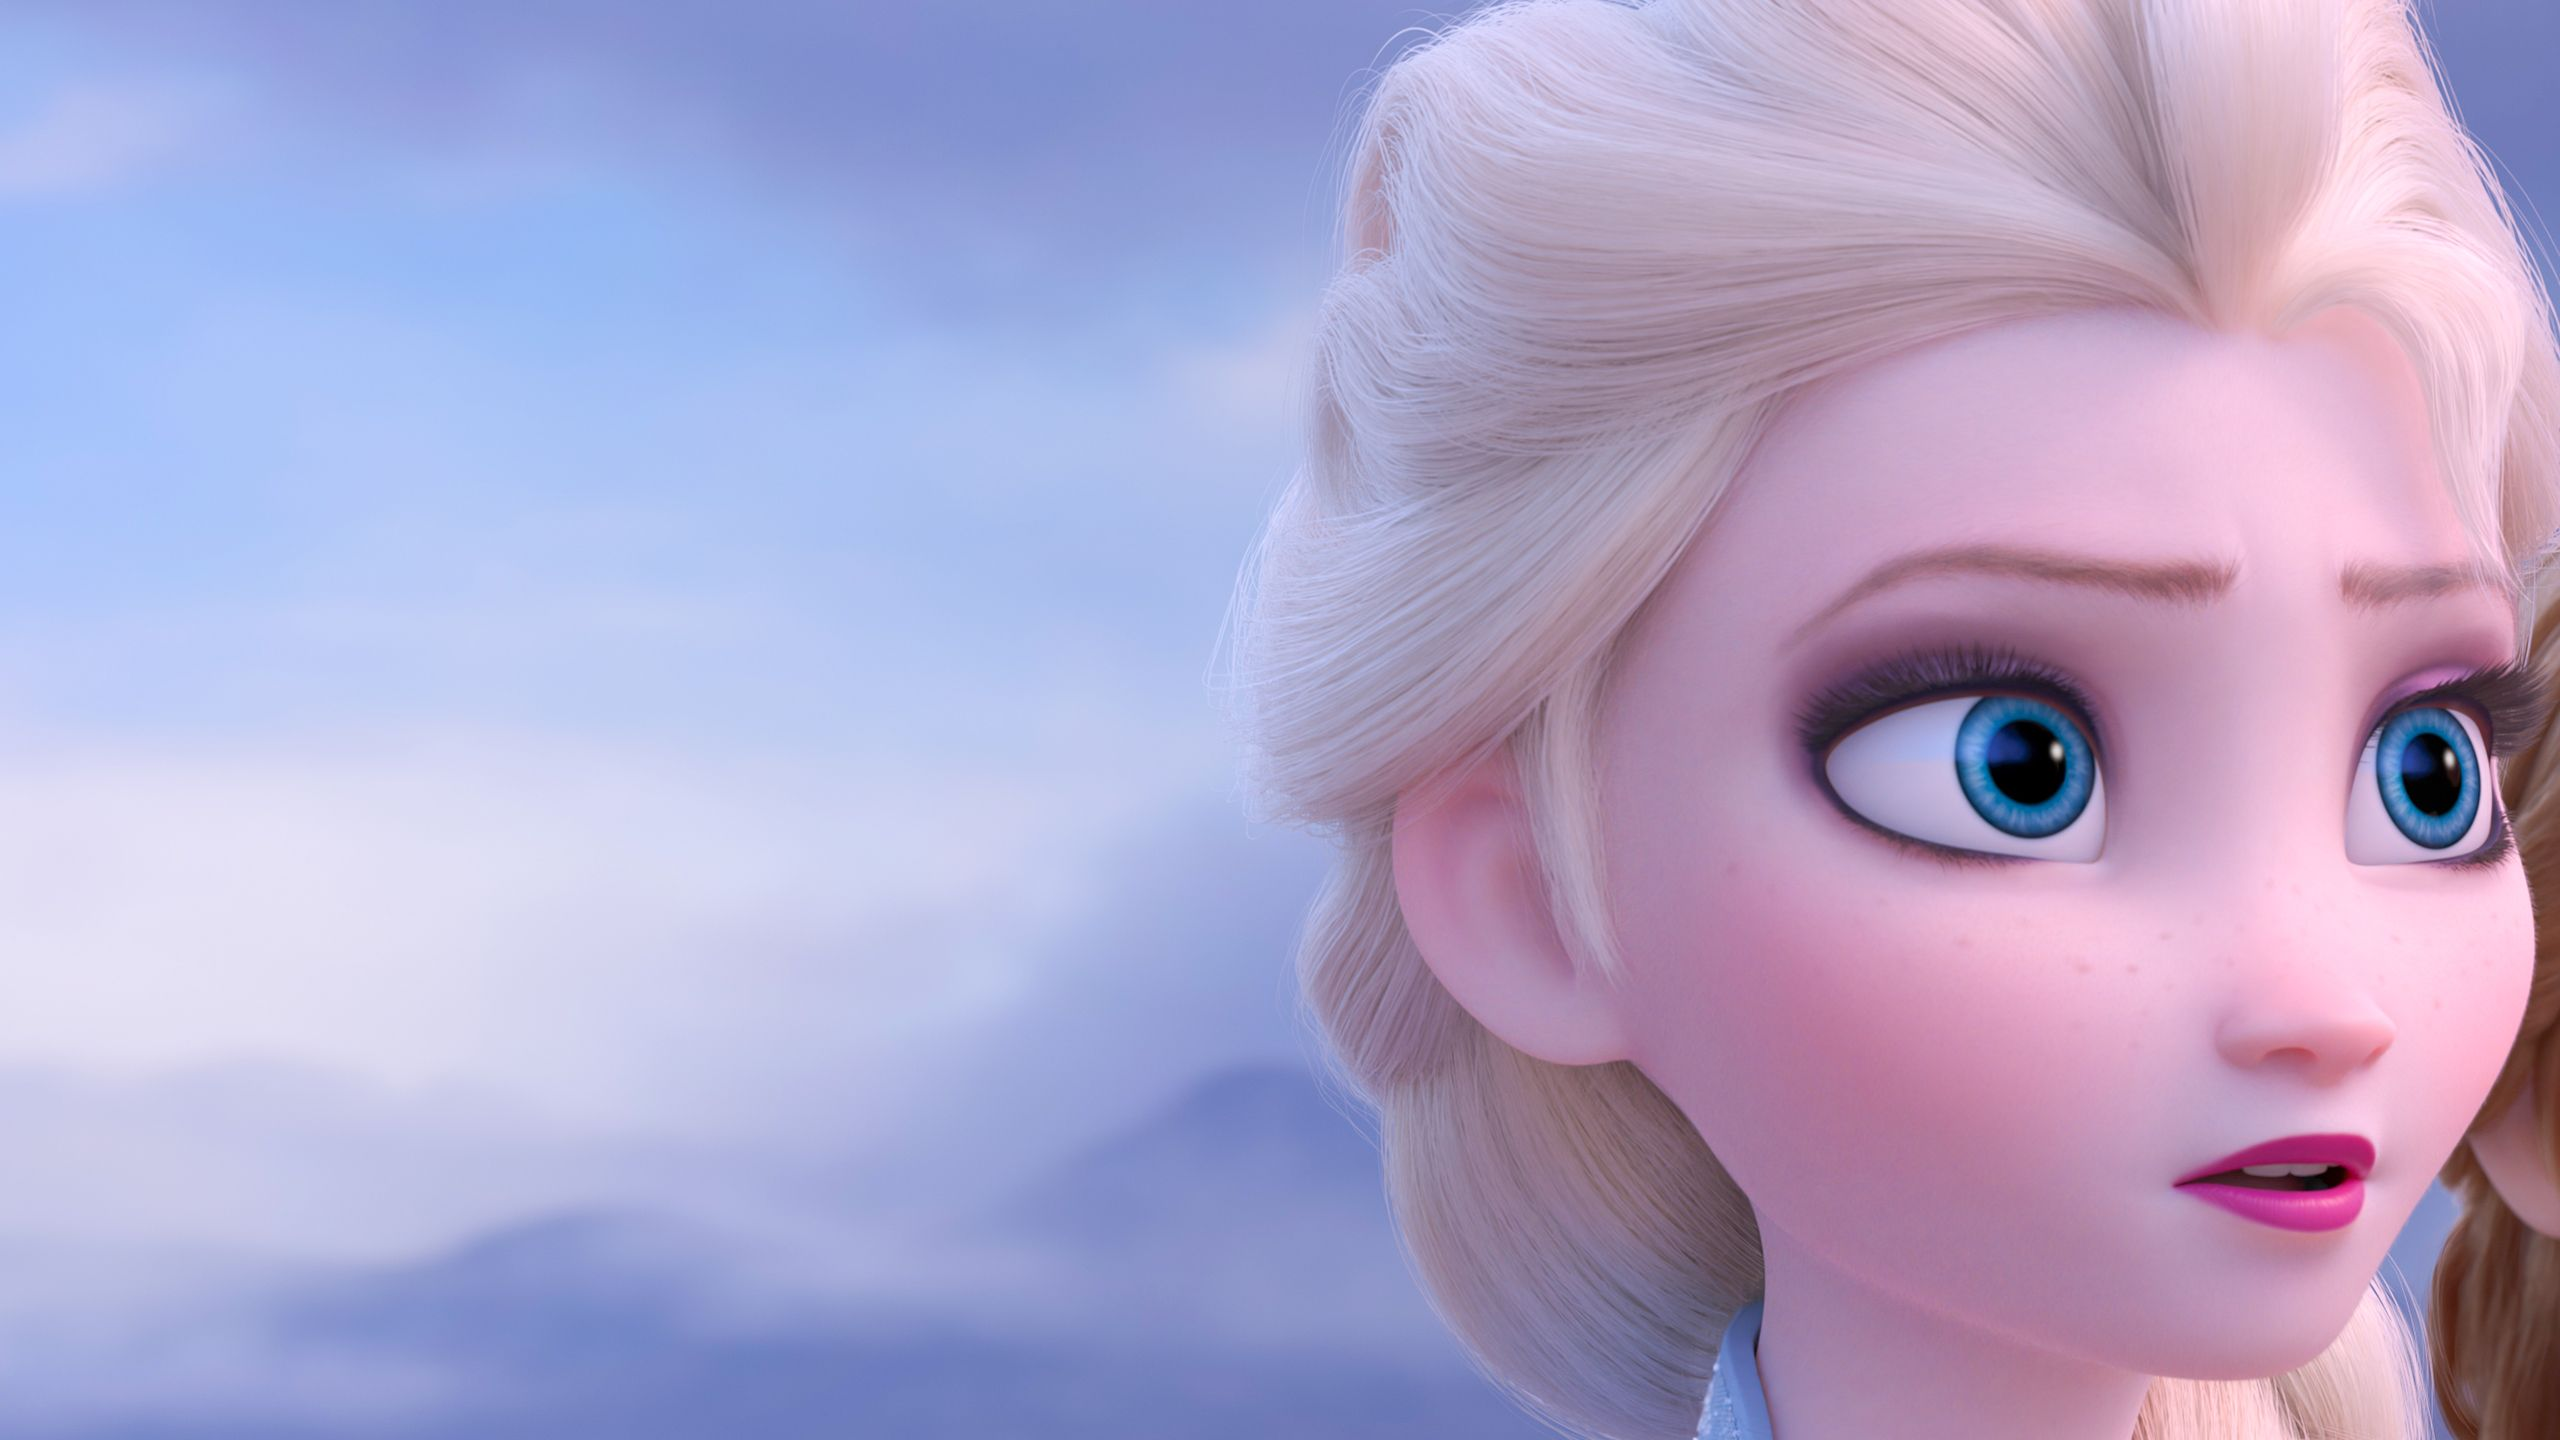 Elsa Wallpapers - Top Free Elsa Backgrounds - WallpaperAccess